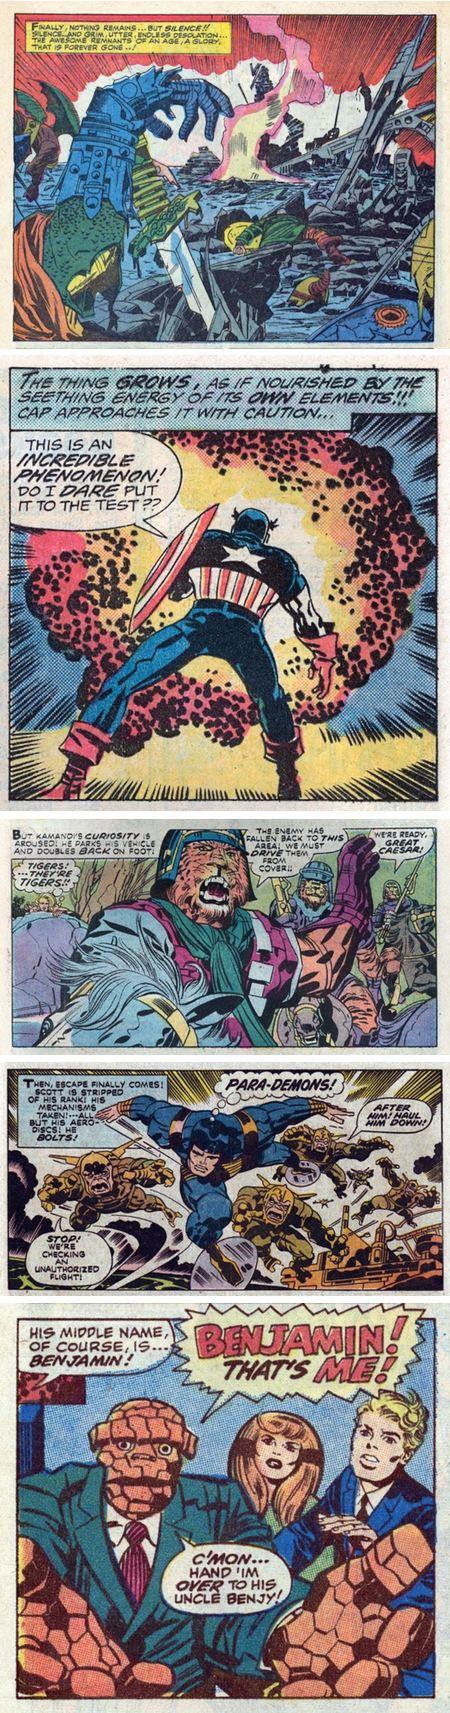 Jack Kirby: Kirb Your Enthusiasm: Thor, Captain America, Kamandi, Mr. Miracle, Fantastic Four